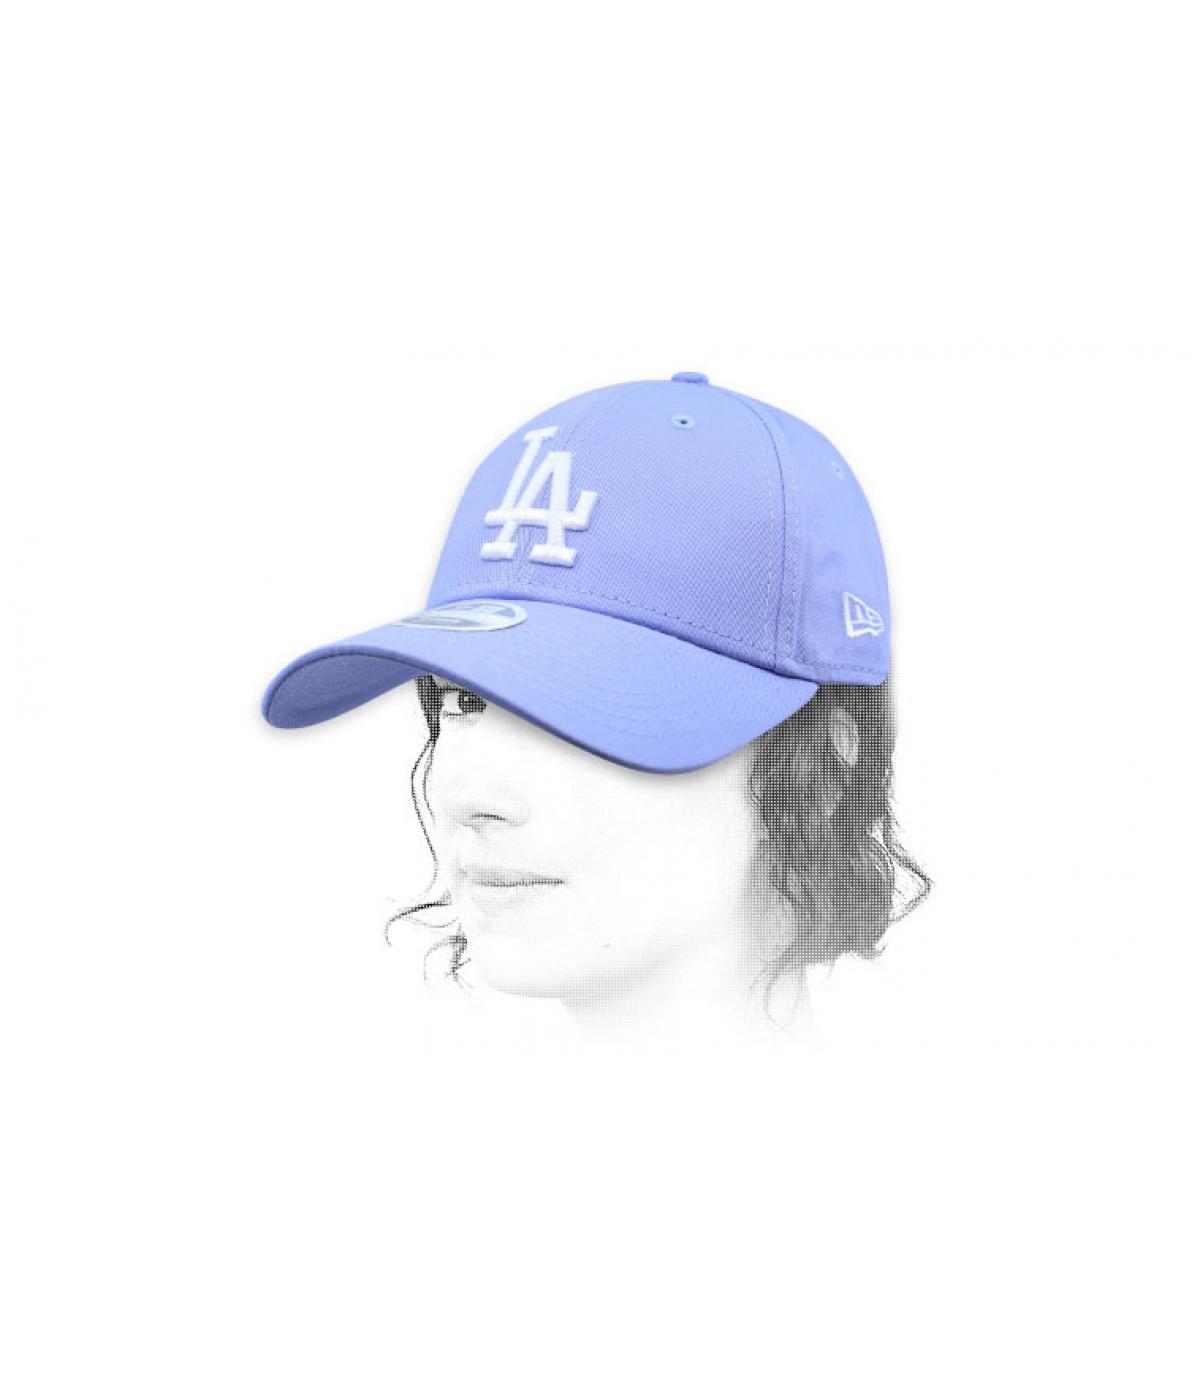 gorra mujer LA azul